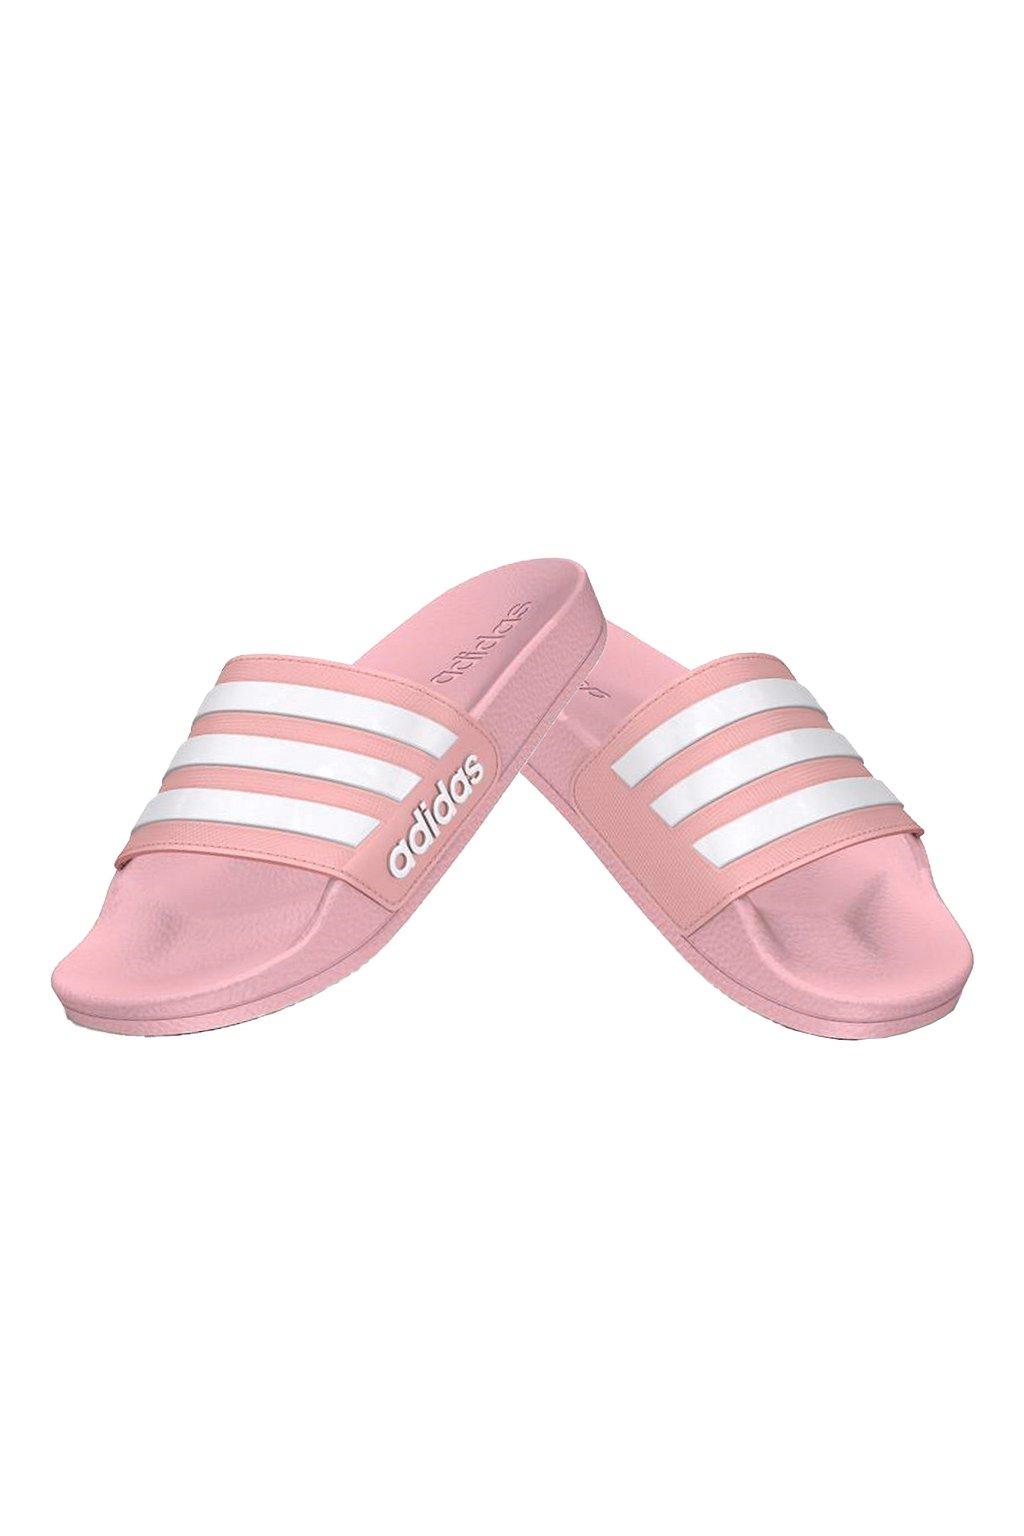 Detské šľapky Adidas Adilette Shower K ružové G27628